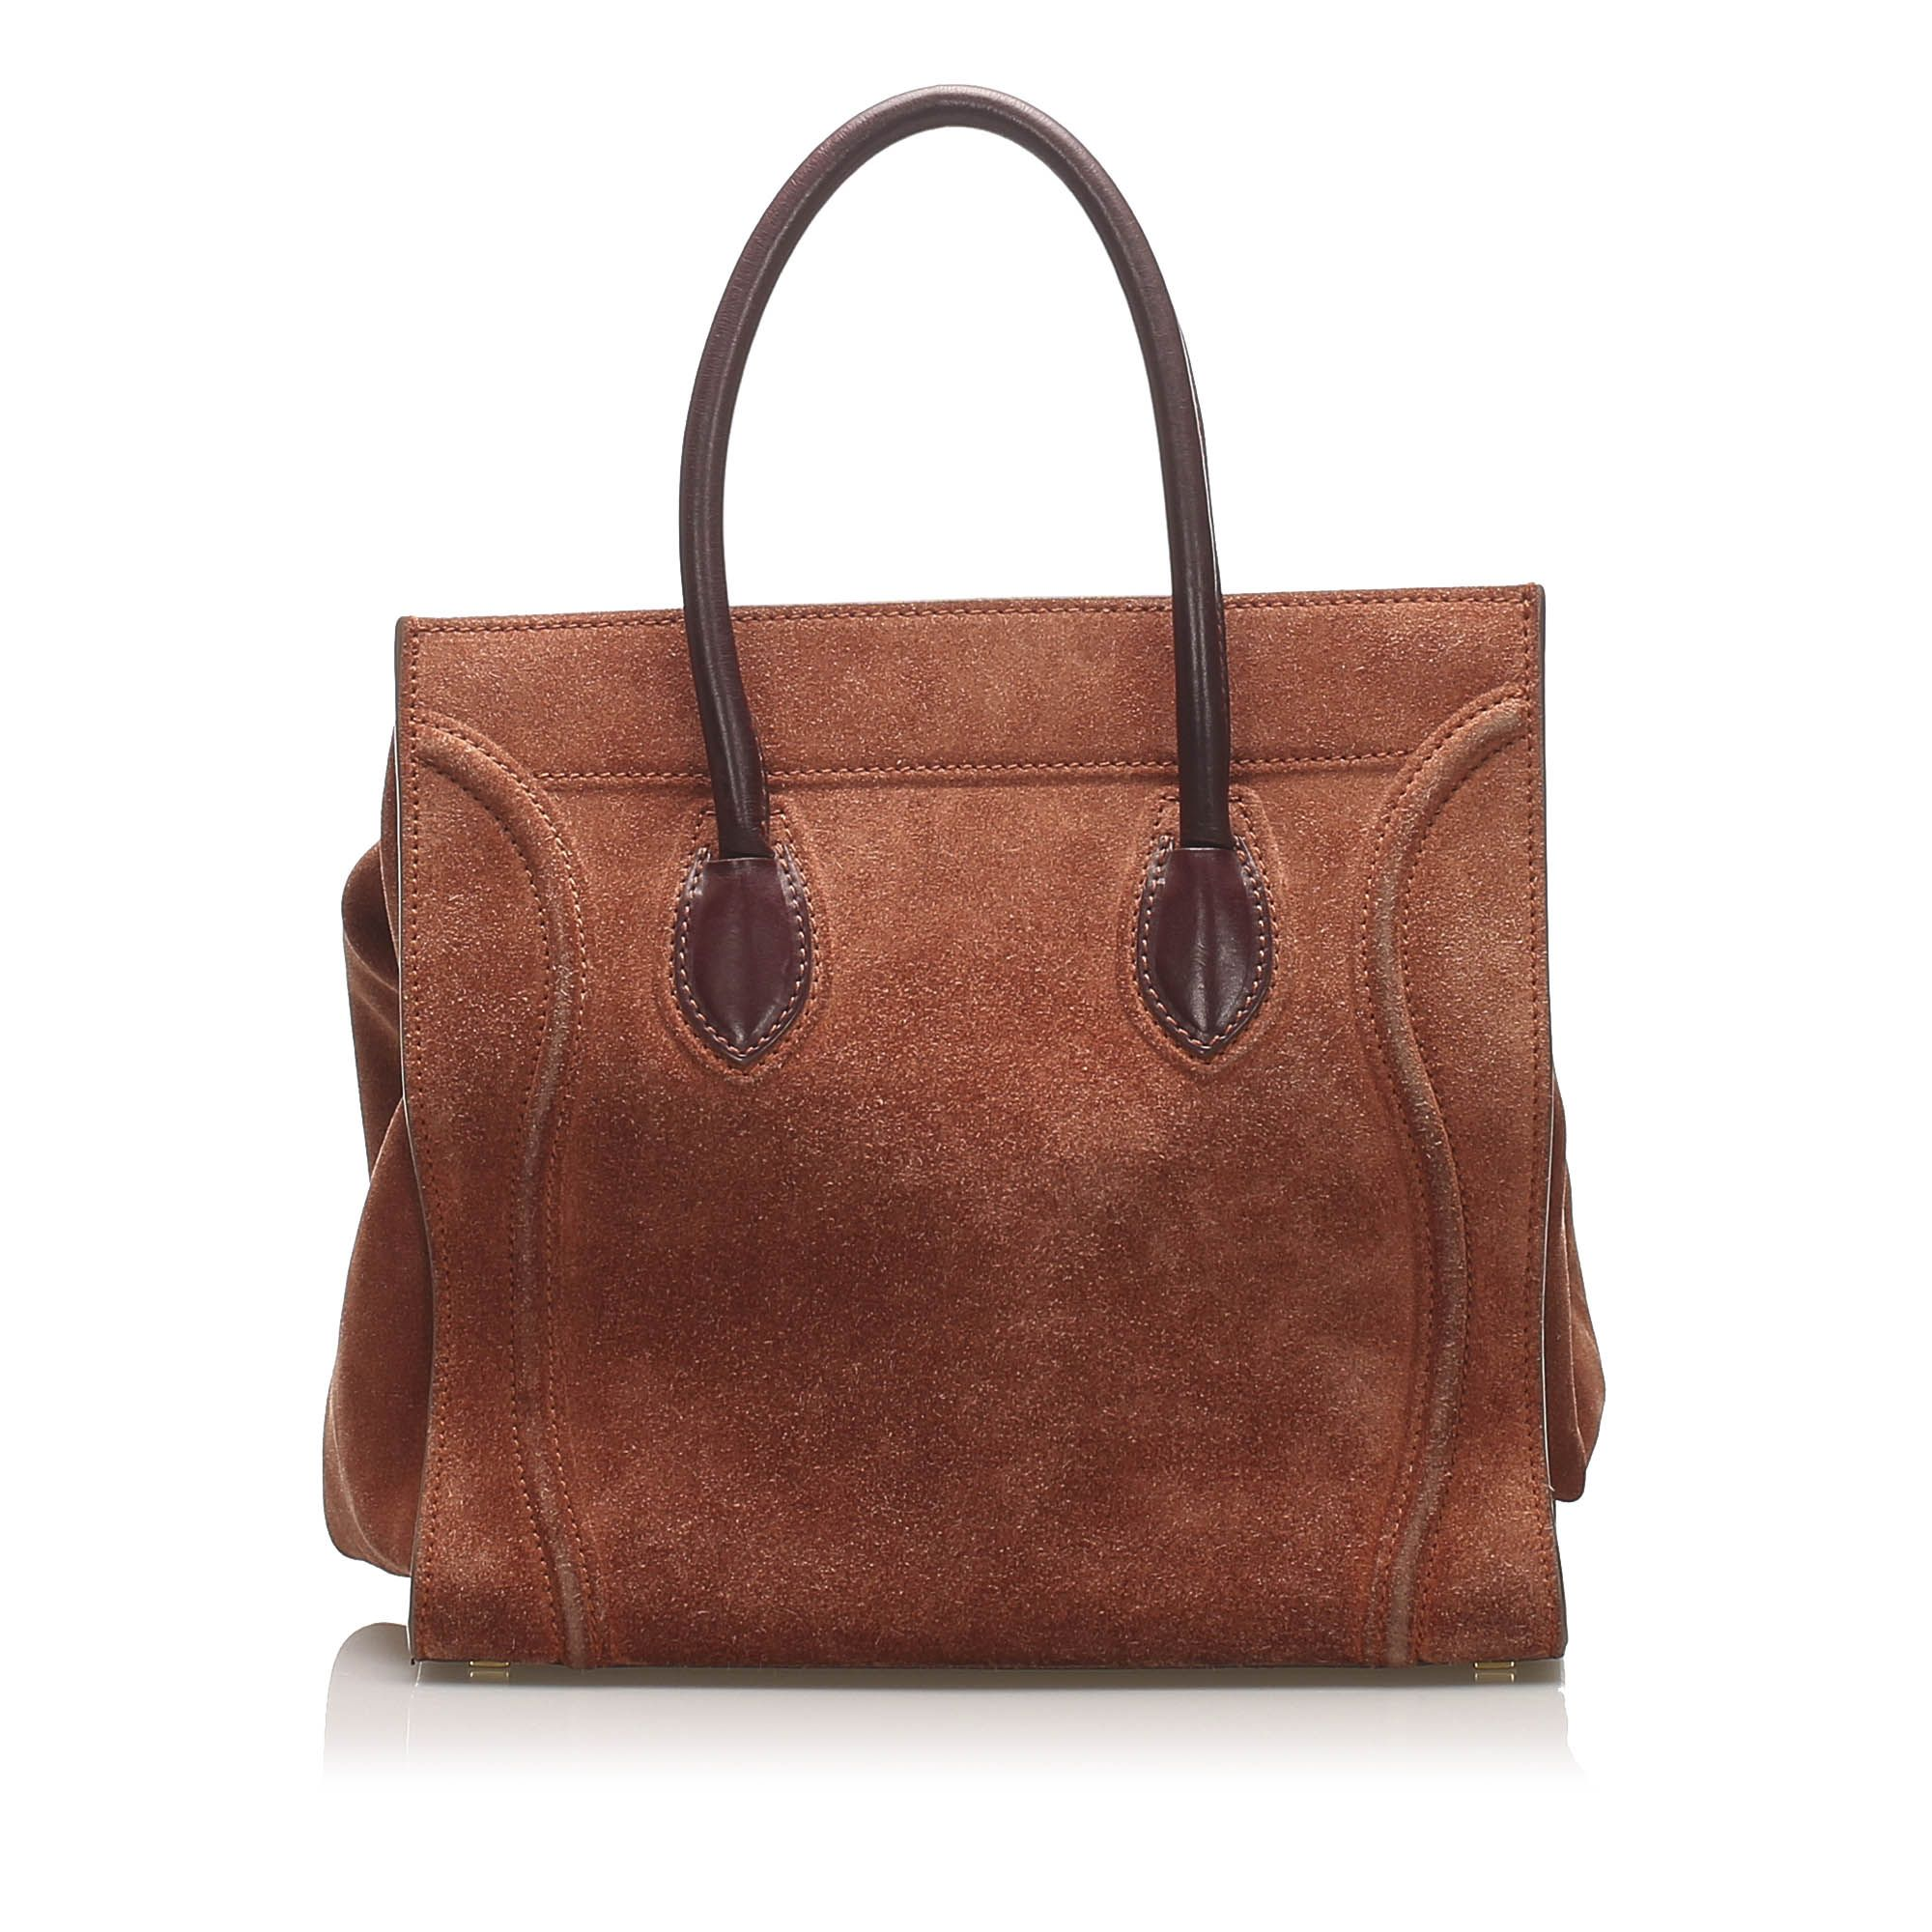 Vintage Celine Phantom Leather Handbag Brown